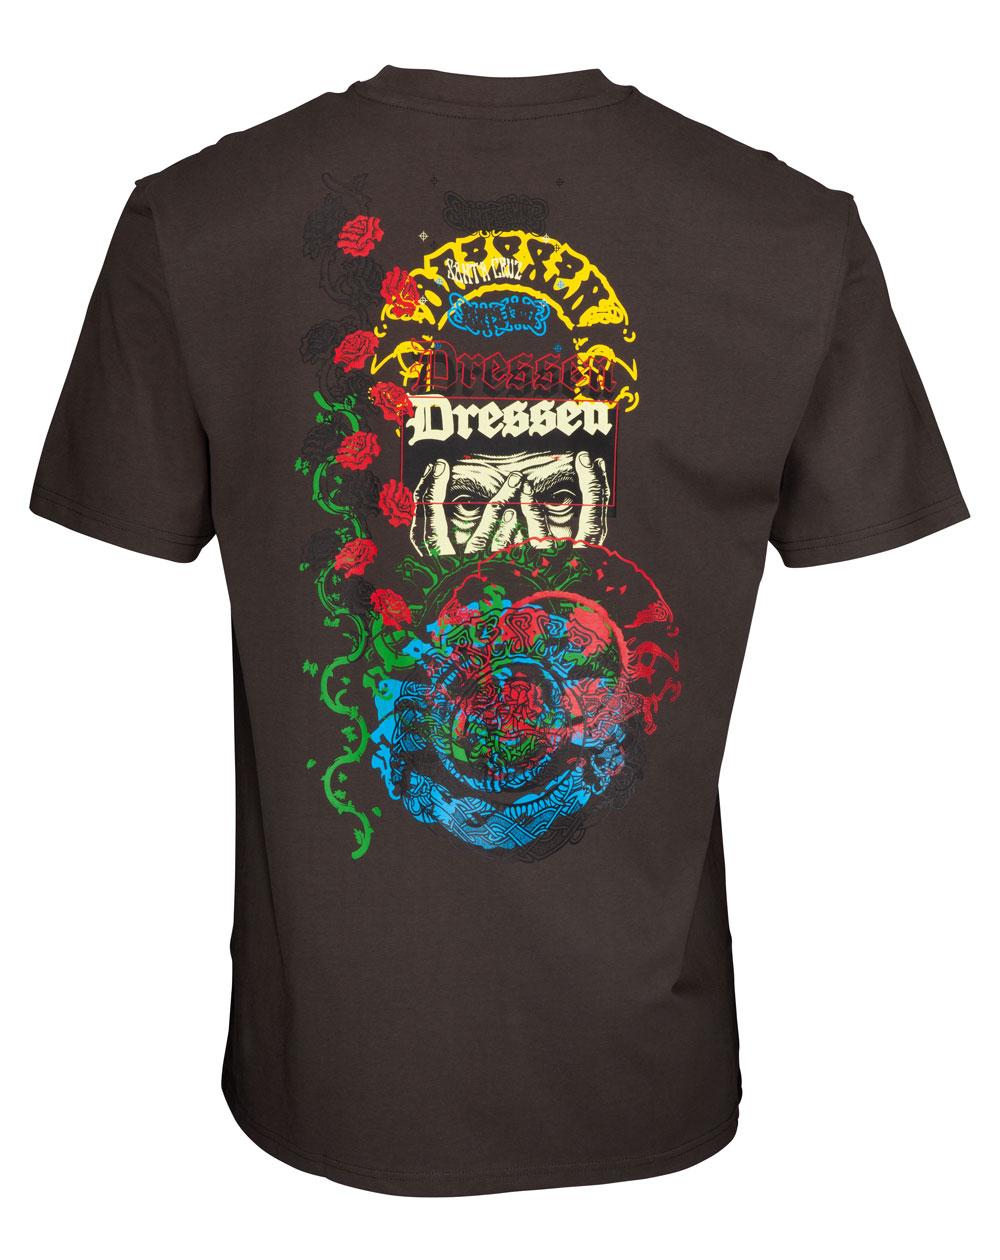 Santa Cruz Men's T-Shirt Dressen Archive Washed Black